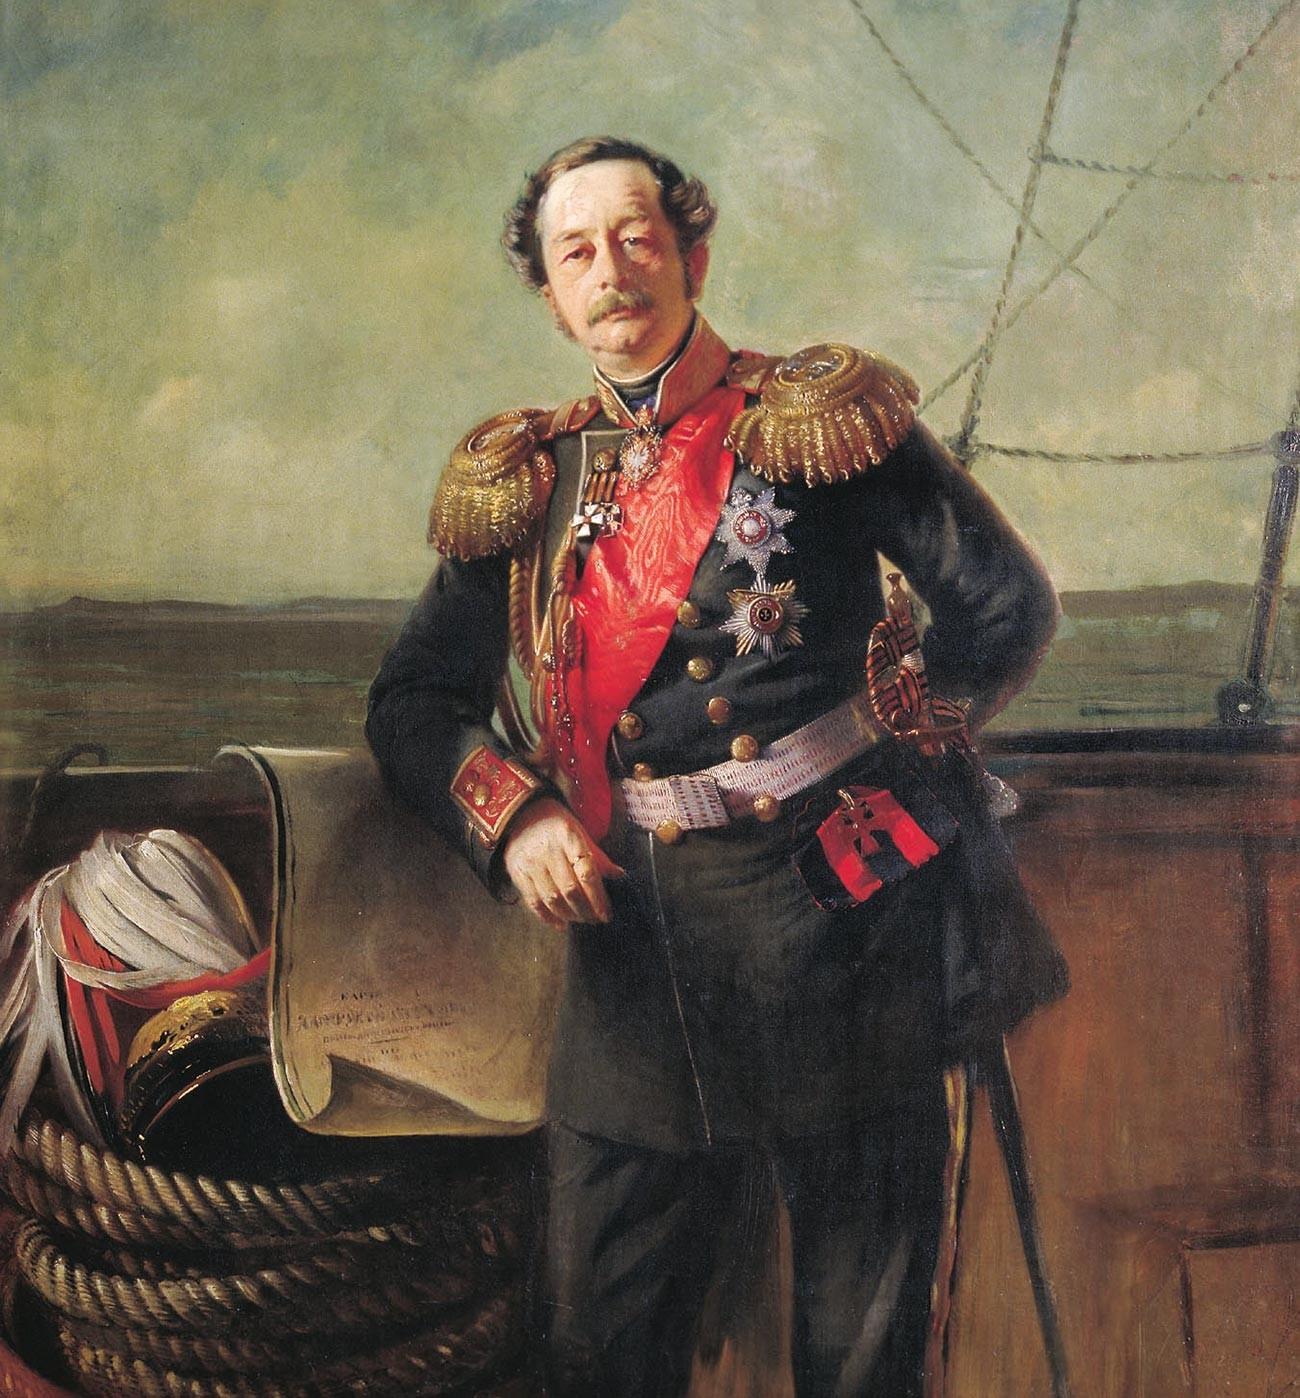 Portrait of the Count Nikolay Muravyov-Amursky.